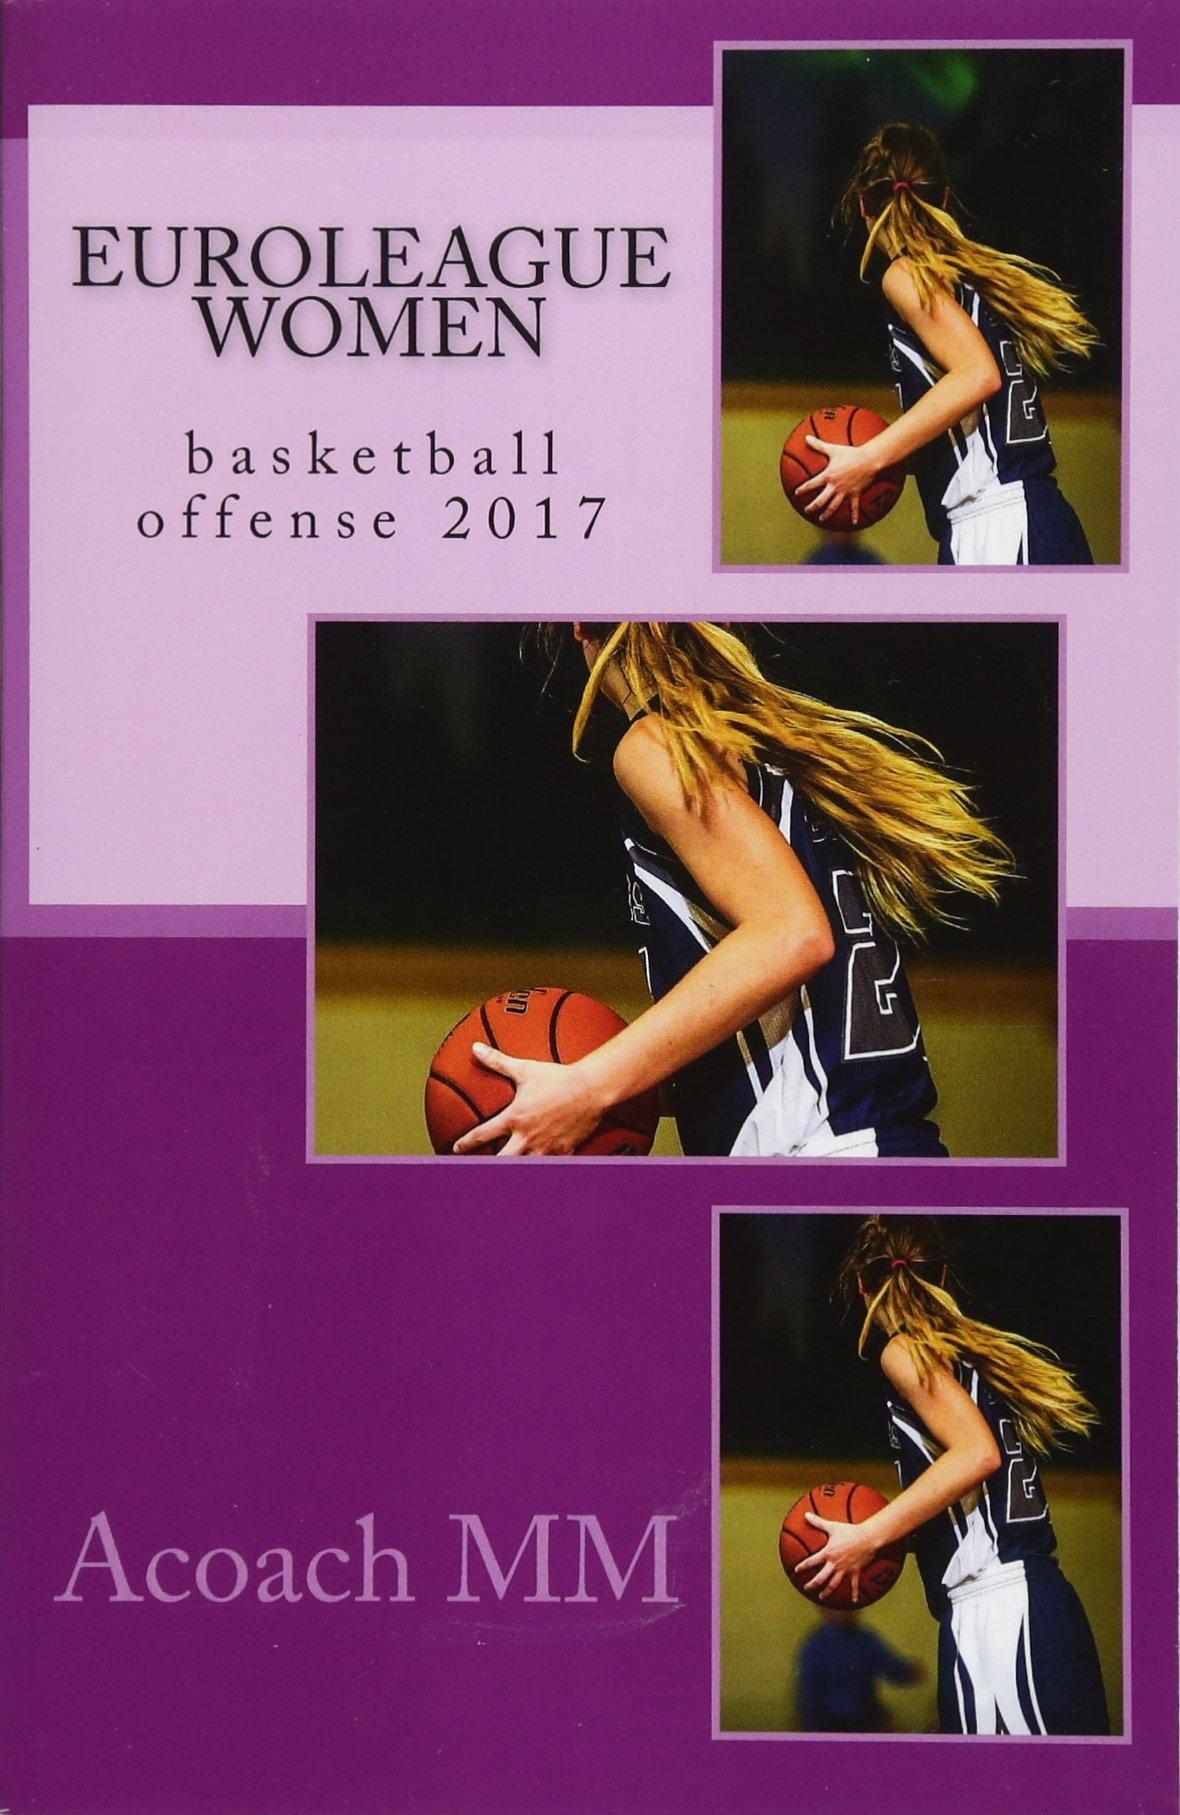 Amazon | Euroleague Women: Basketball Offense 2017 | Mm, Acoach ...